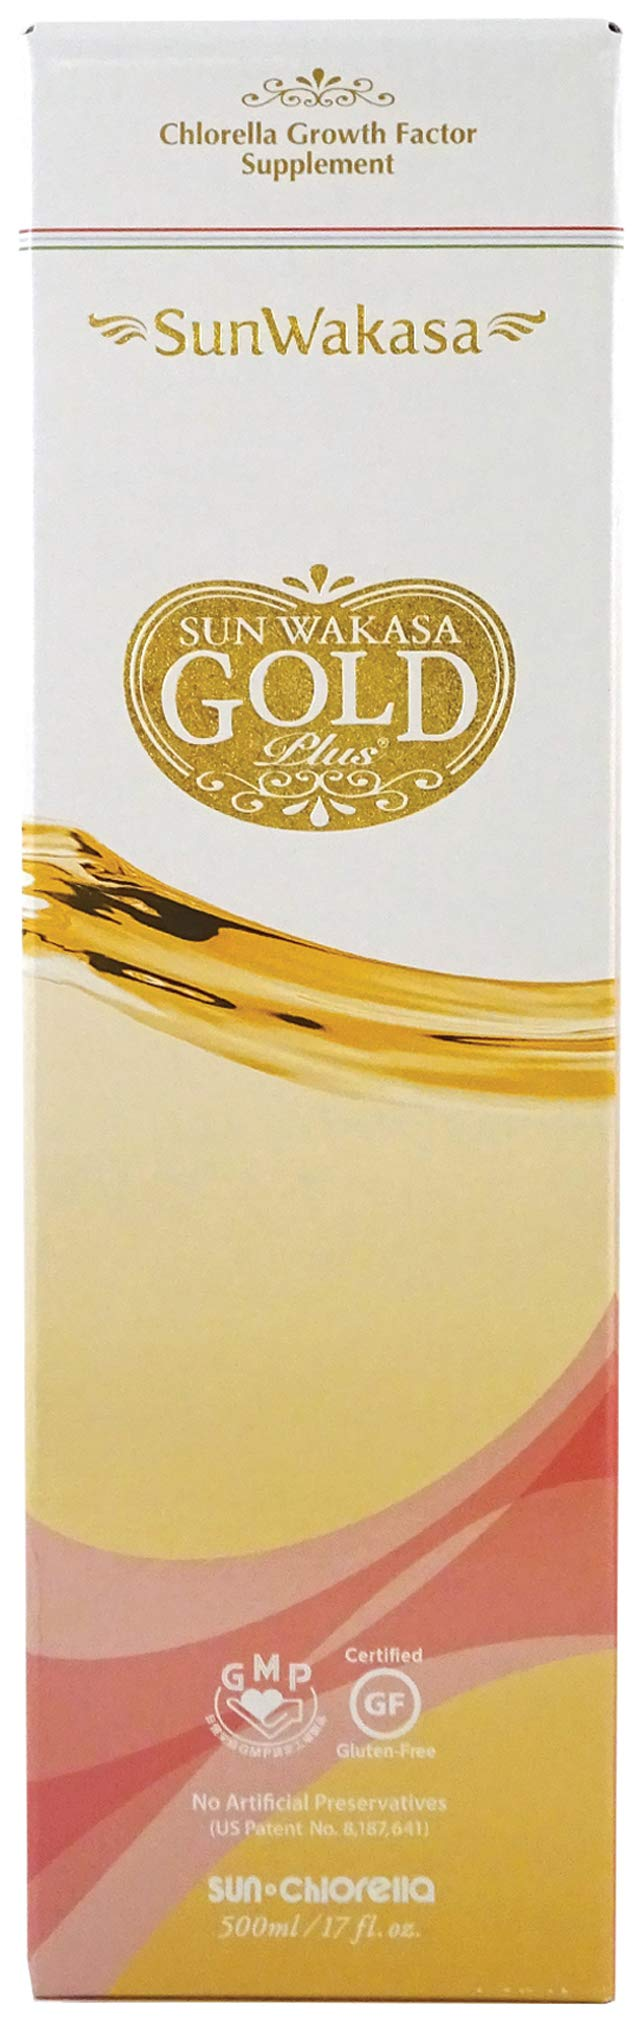 Sun Chlorella- Sun Wakasa Gold with Chlorella Growth Factor- Support Your Health On A Cellular Level (17 Fluid Ounce) by Sun Chlorella (Image #3)